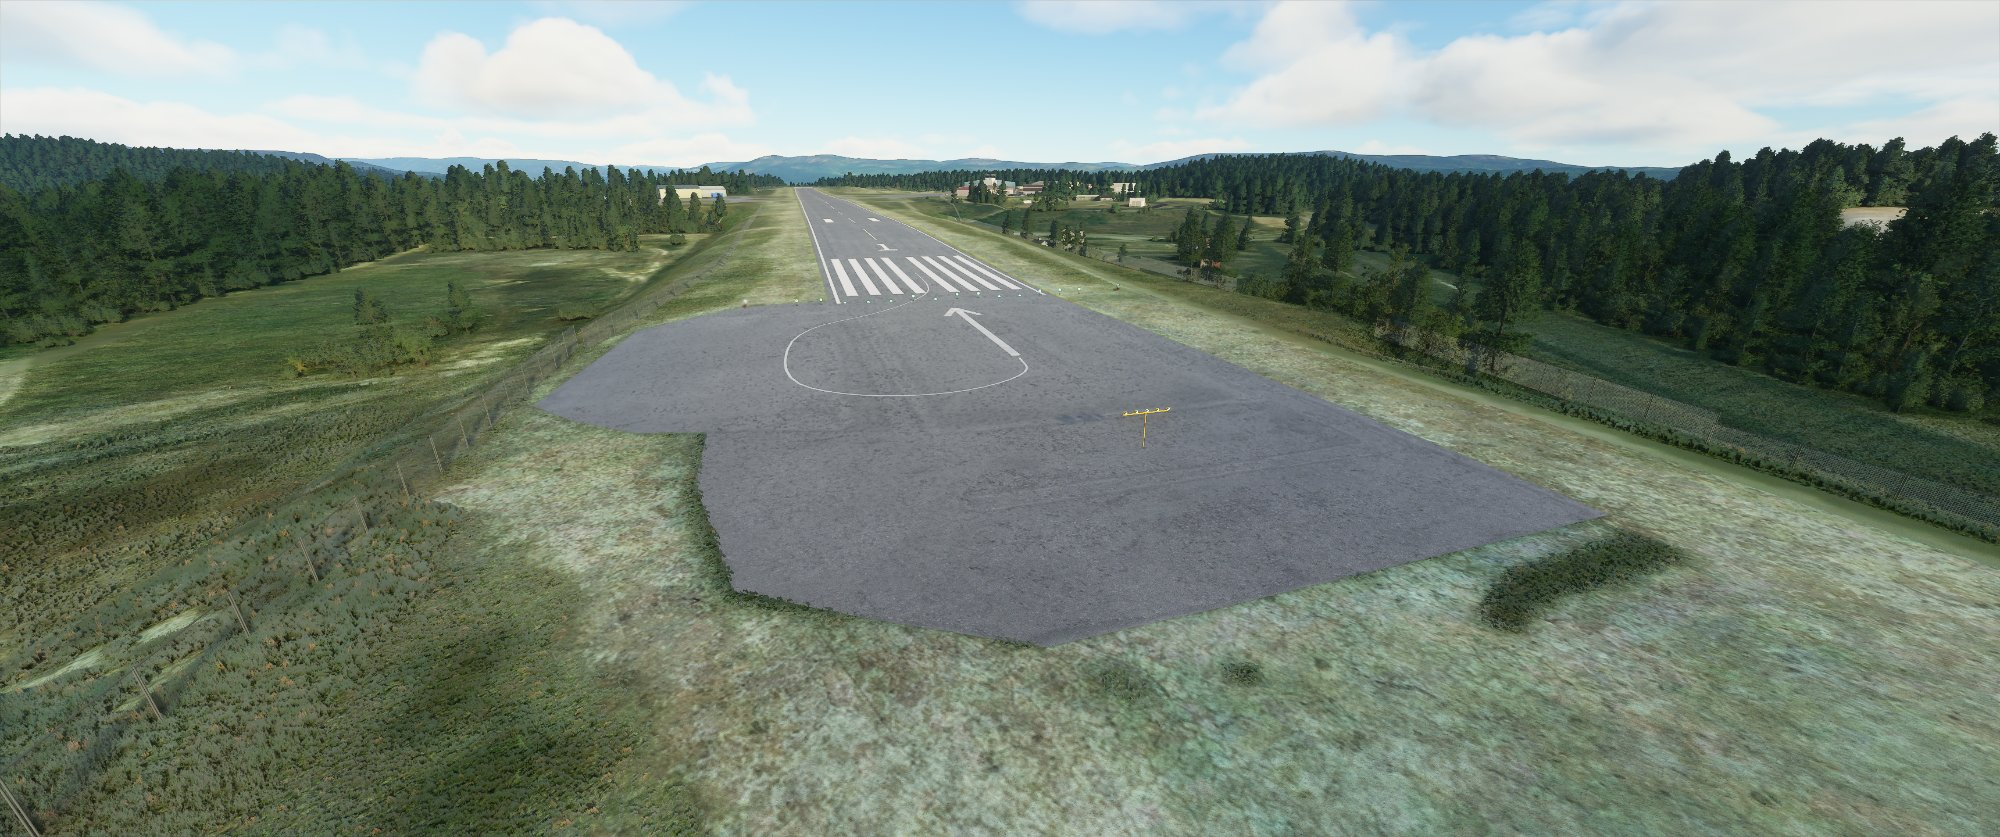 Microsoft Flight Simulator Screenshot 2020.10.28 - 11.41.04.69.jpg